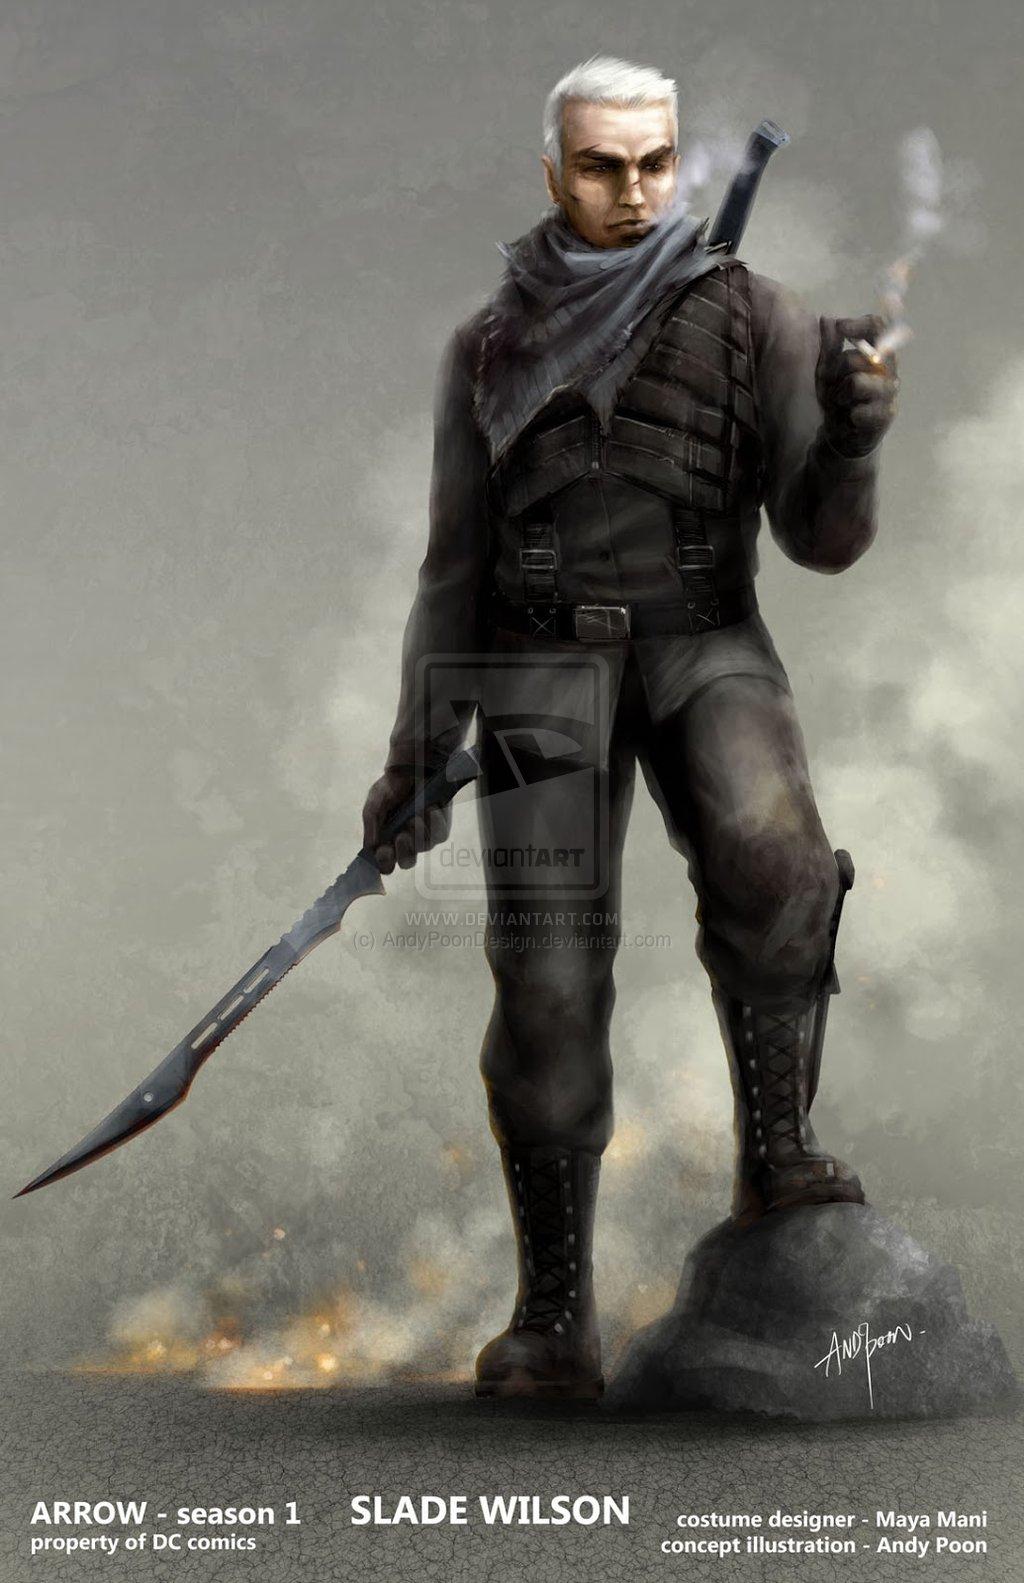 Arquivo:Slade Wilson concept artwork season 1.png